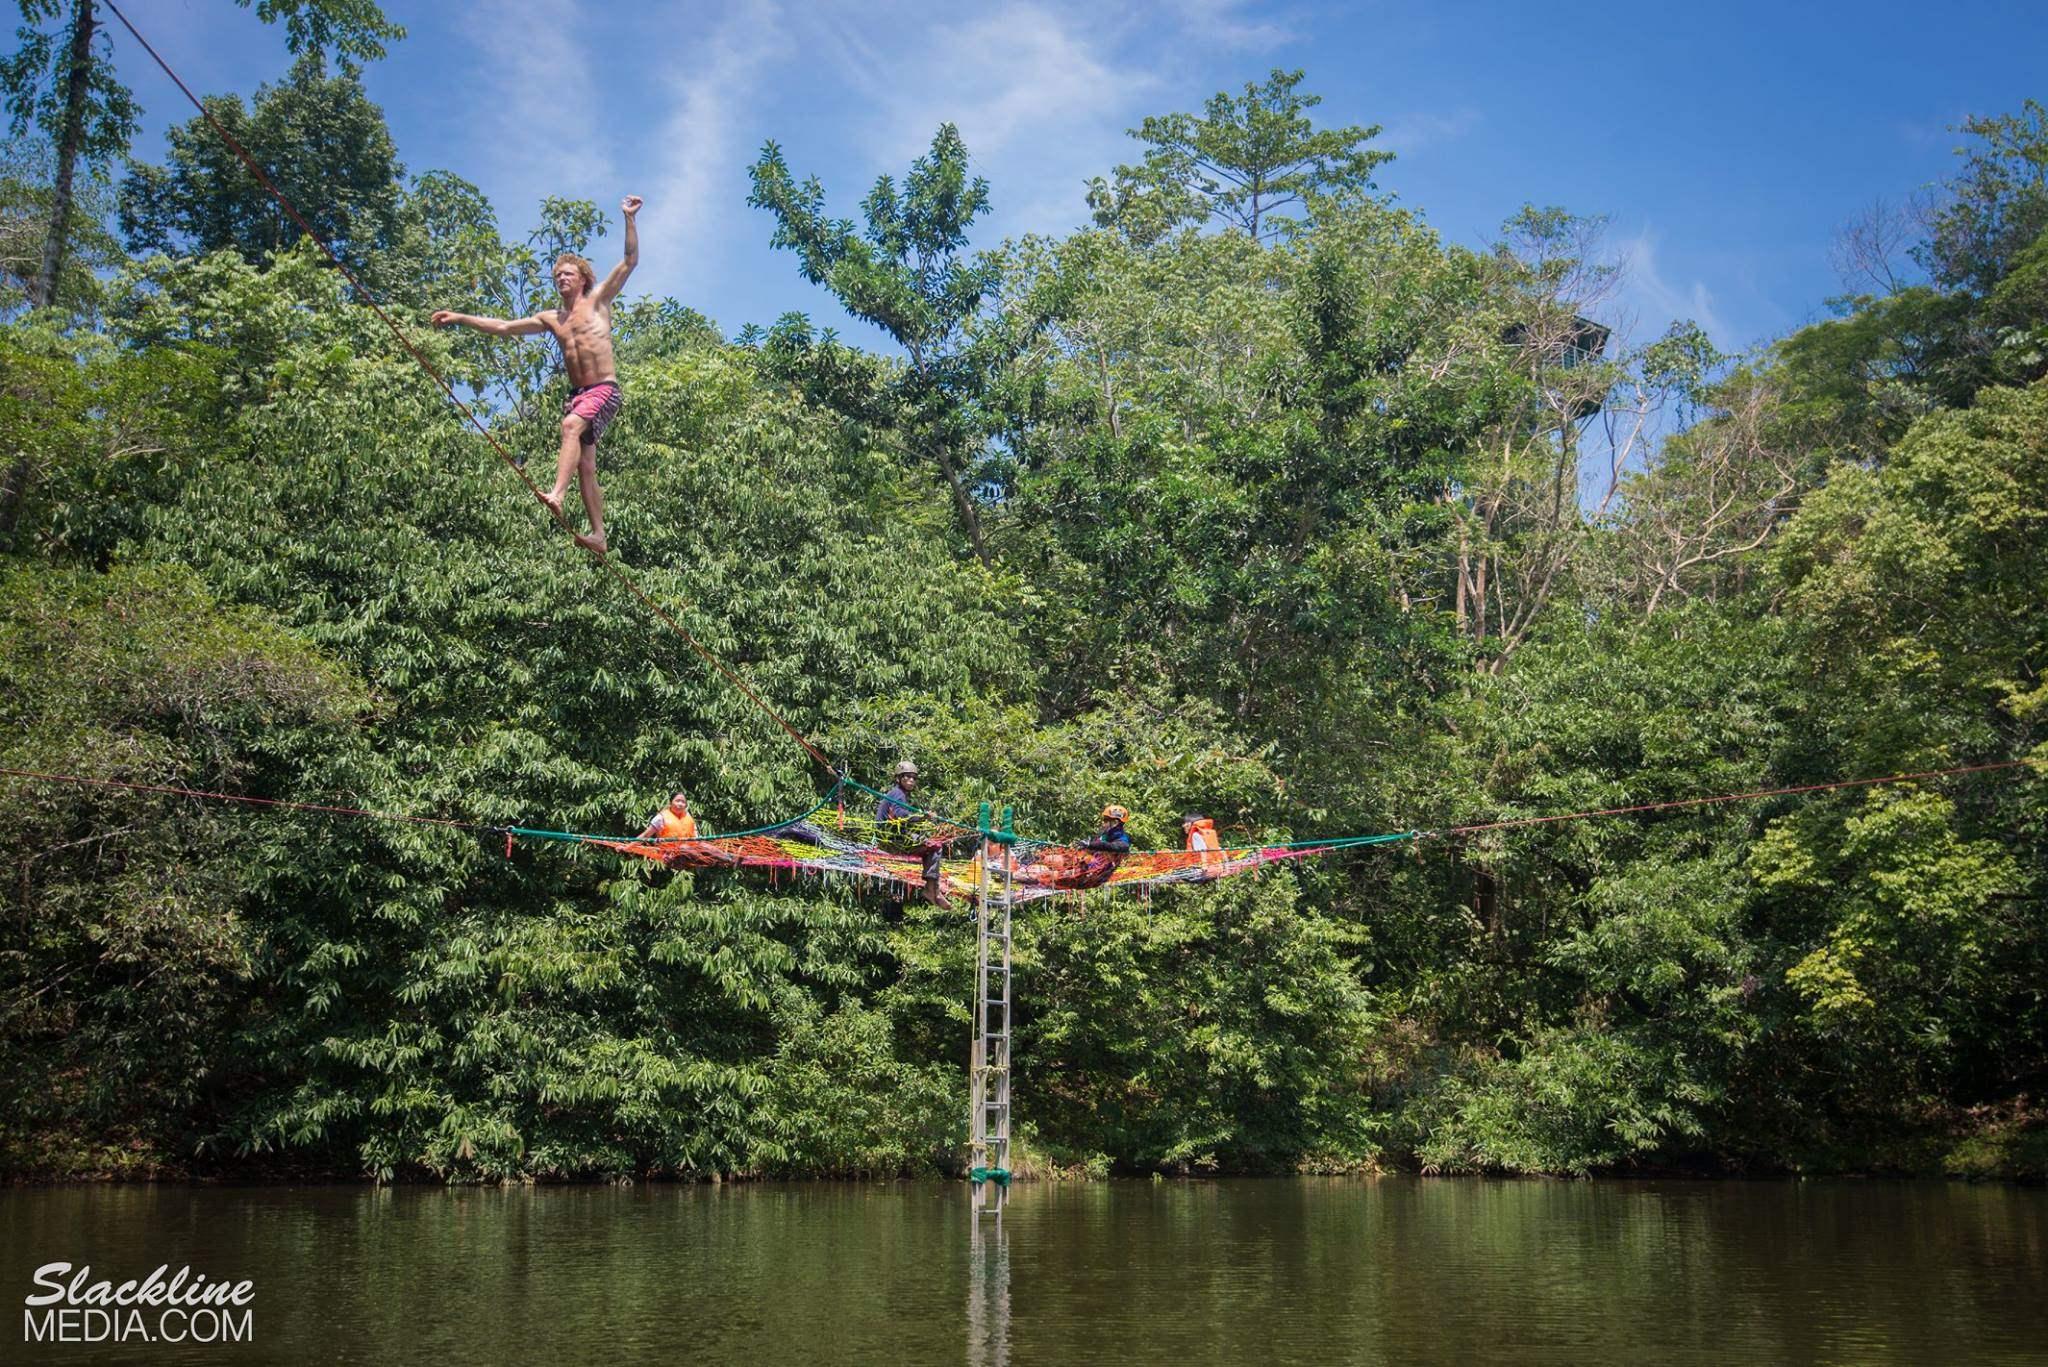 rainforest-discovery-centre-sandakan-in-borneo-3-.jpg